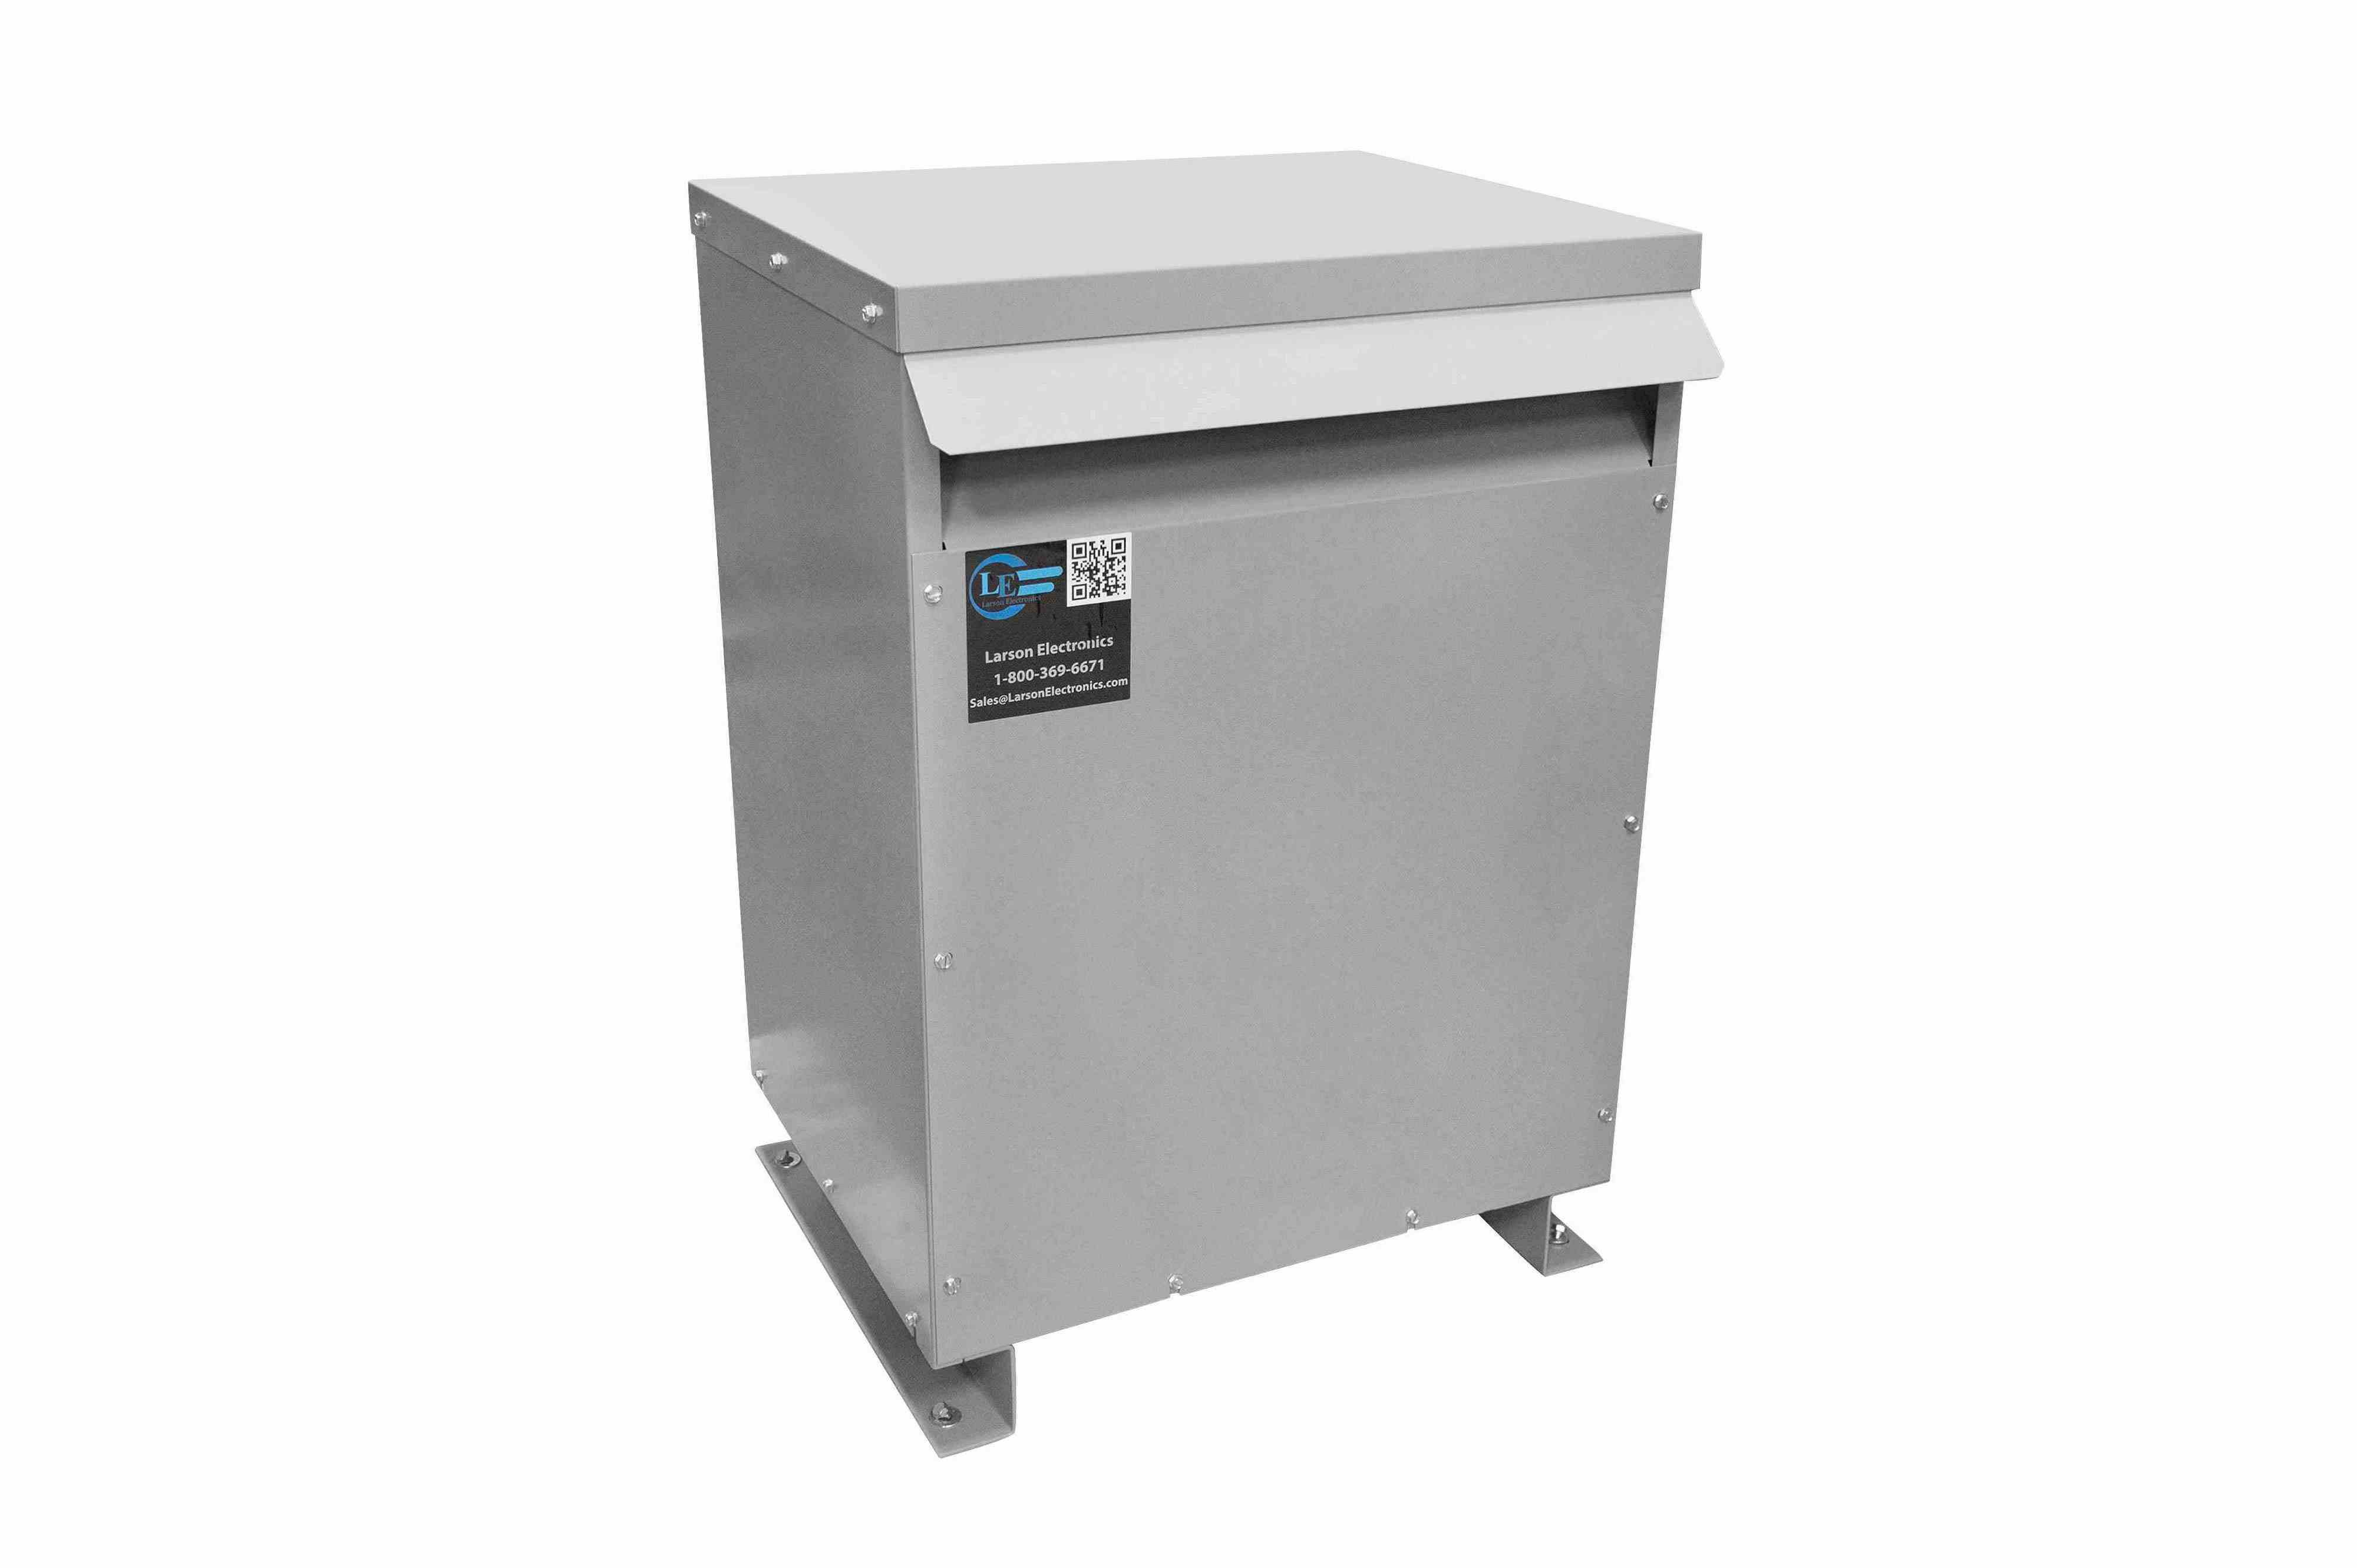 25 kVA 1PH DOE Efficiency Transformer, 240V Primary, 480V Secondary, NEMA 3R, Ventilated, 60 Hz